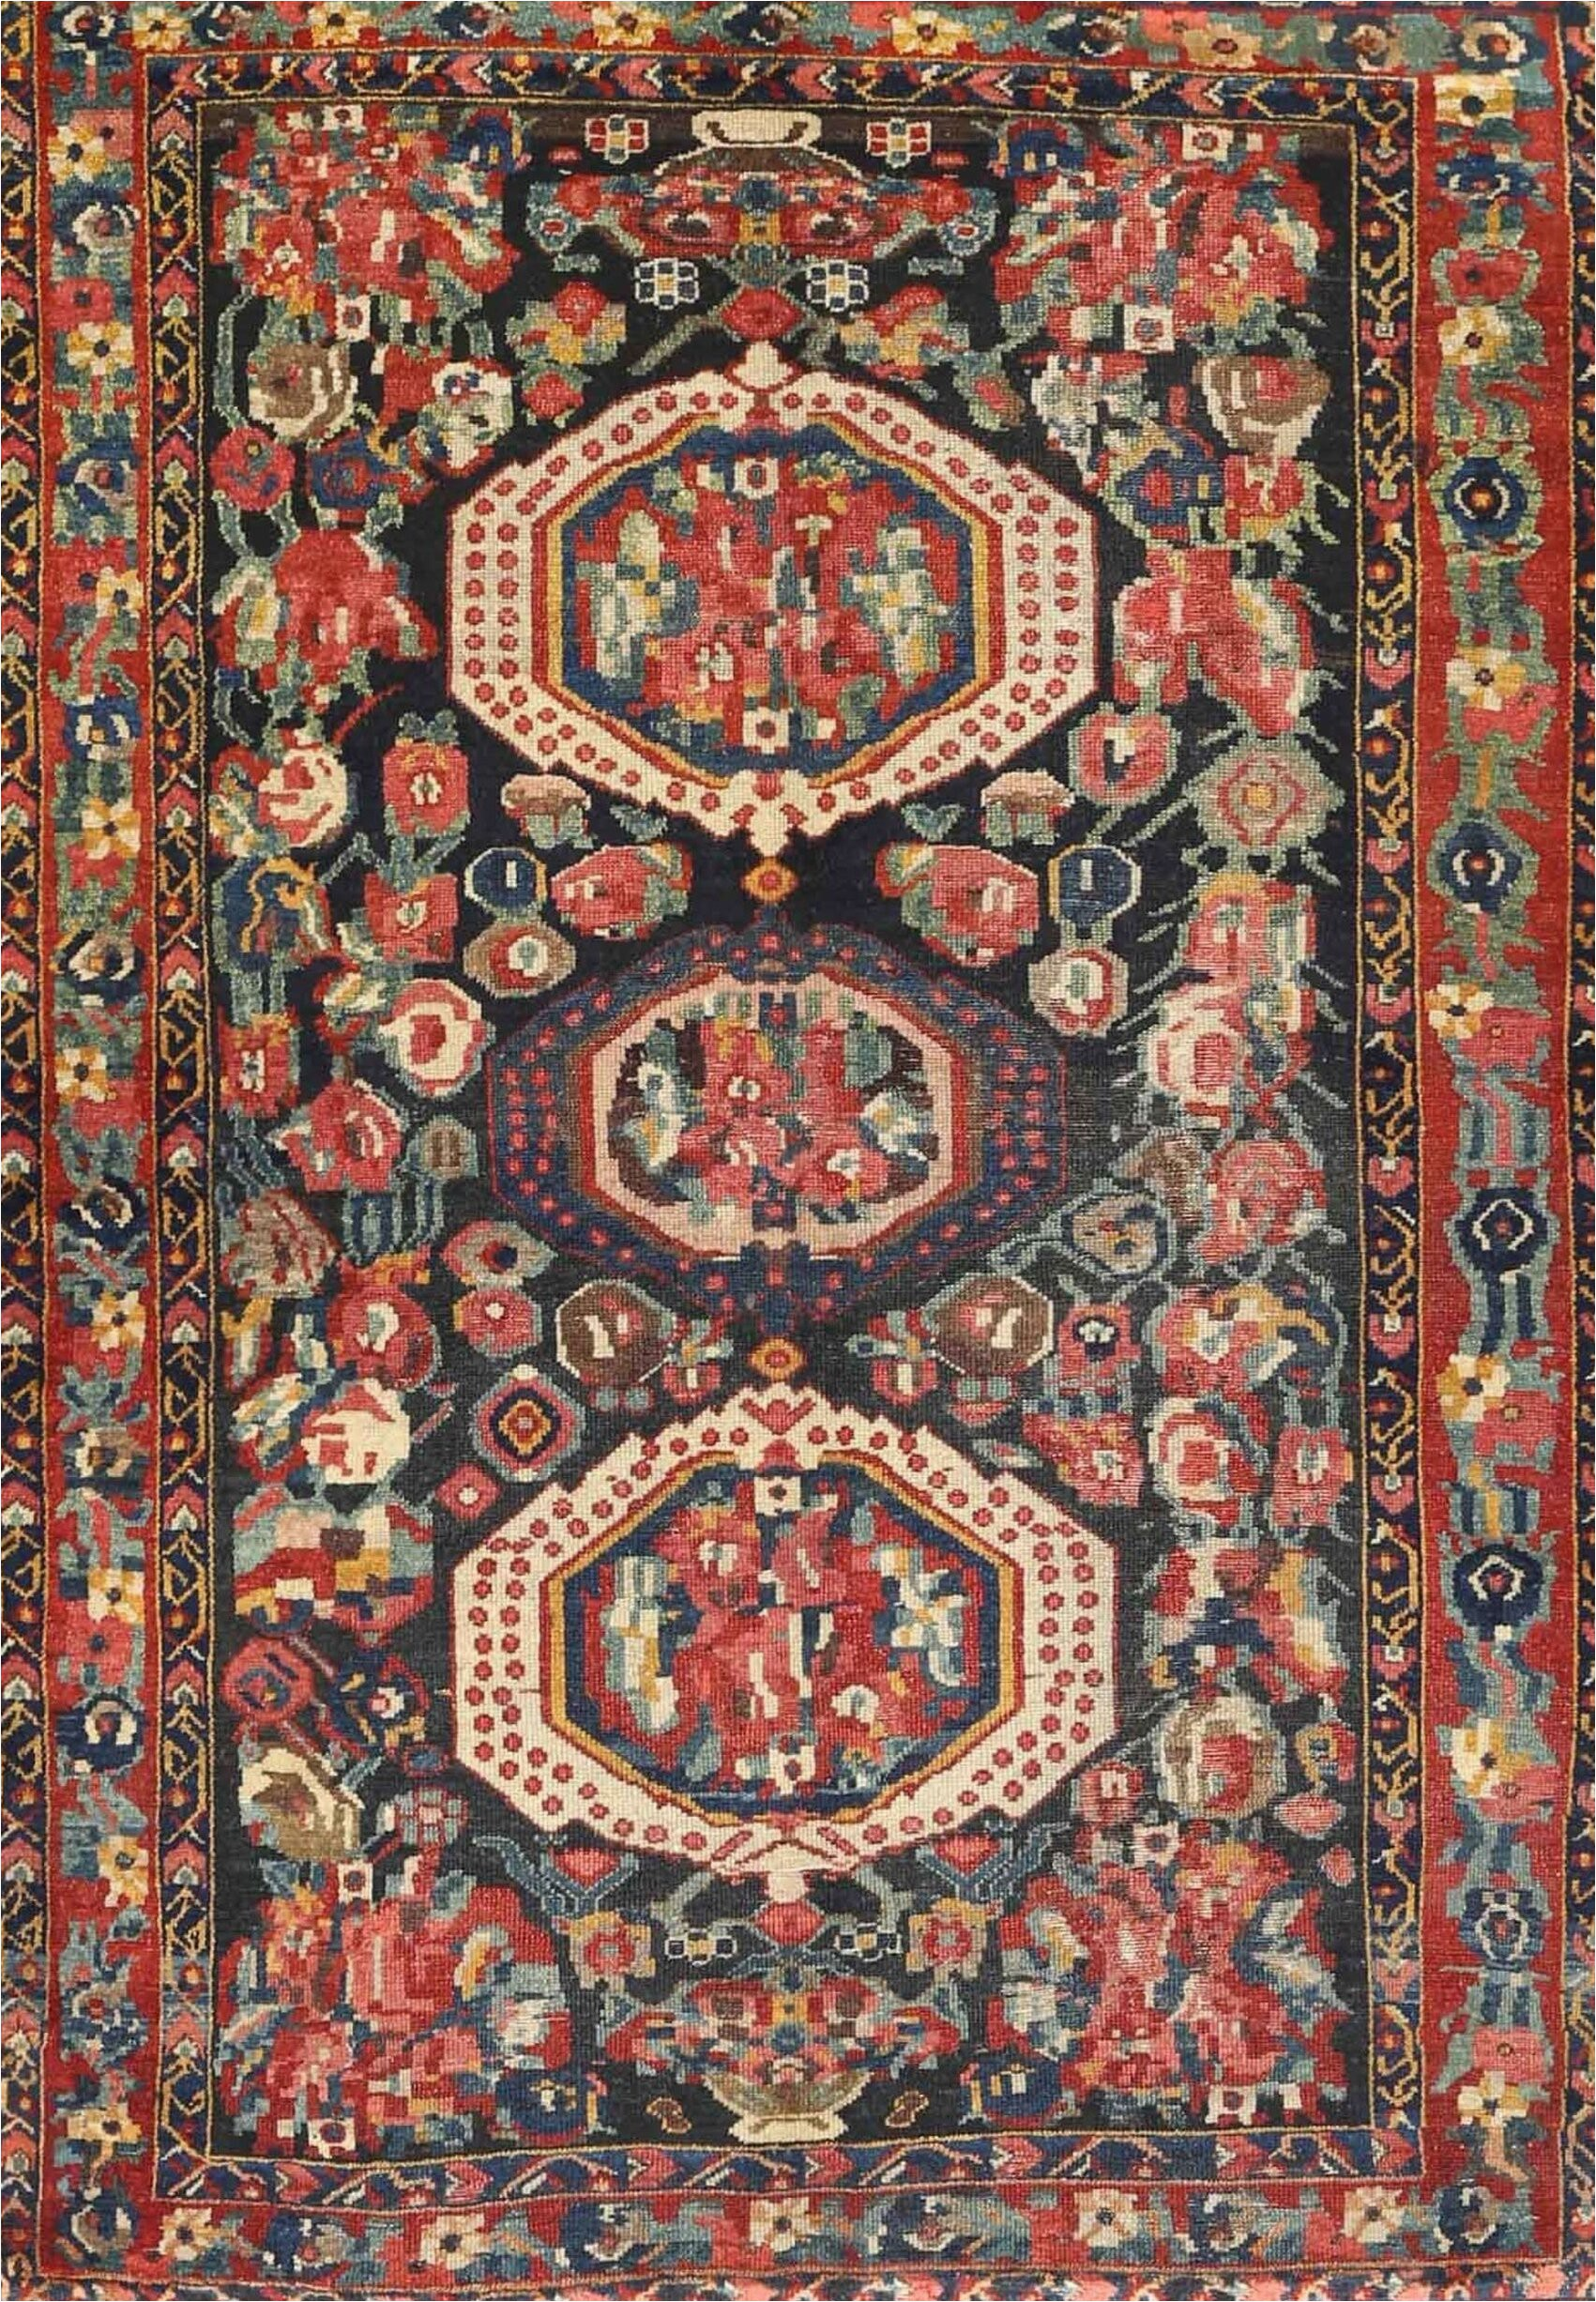 thibault traditional brownblackred area rug